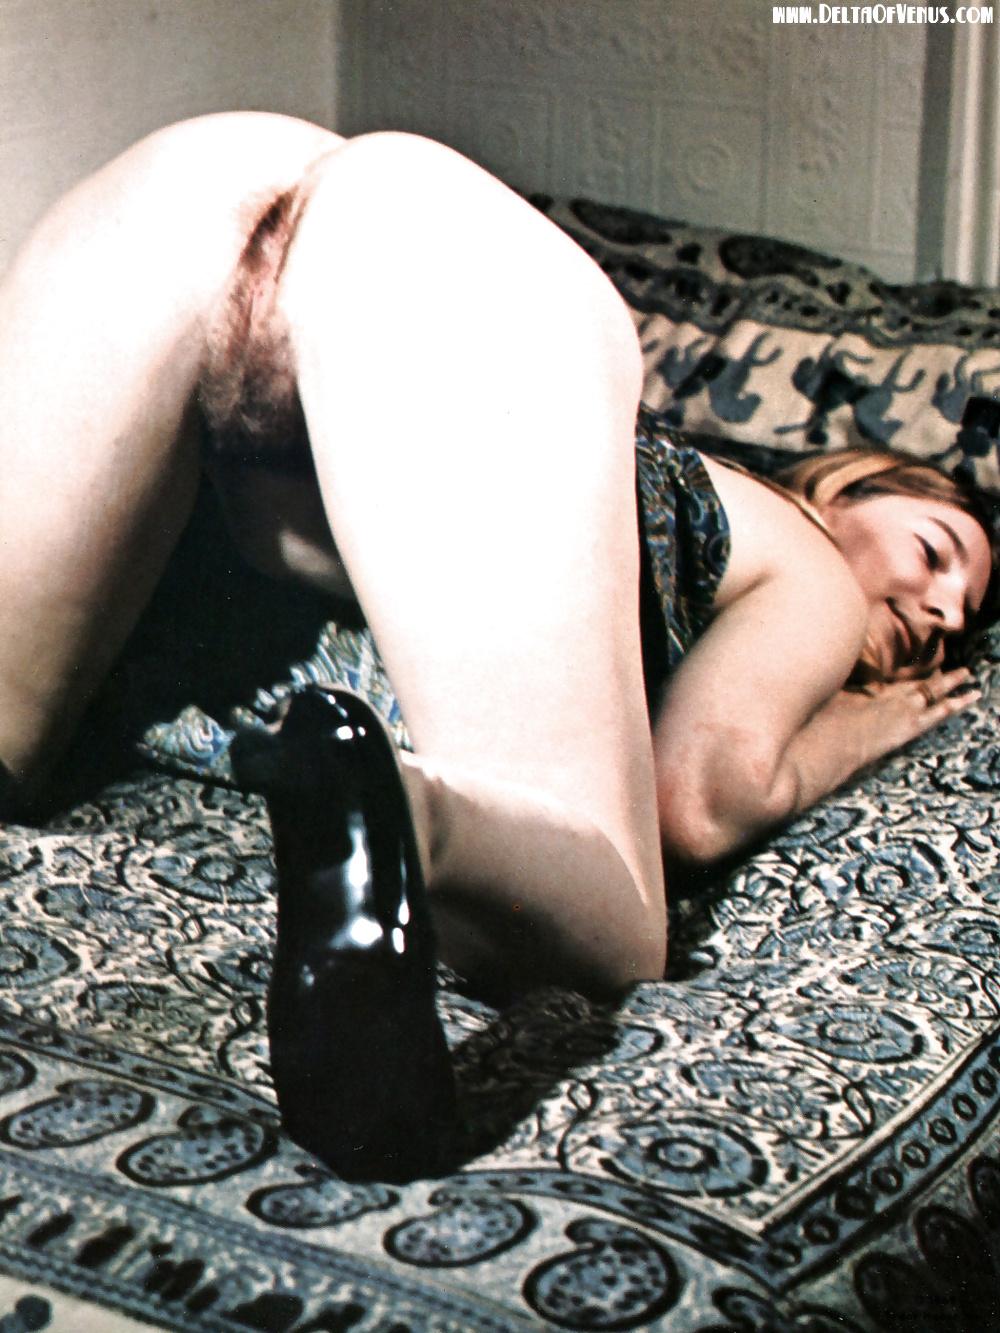 Star wars sex slave women naked